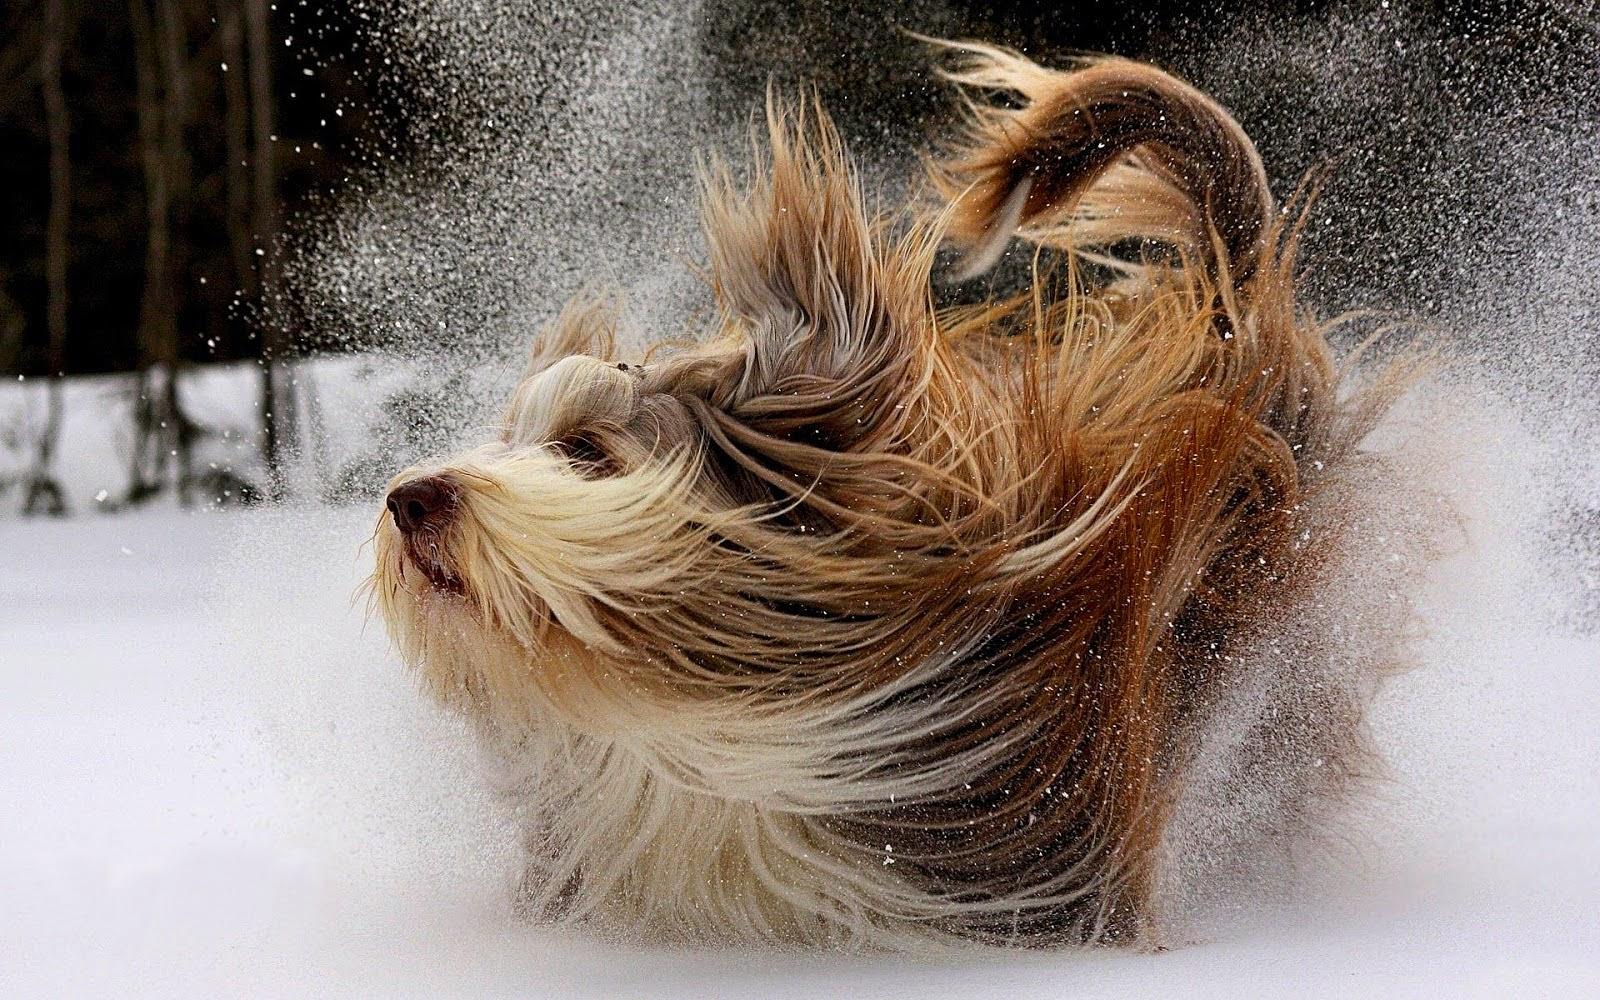 Winter wallpaper met langharige hond